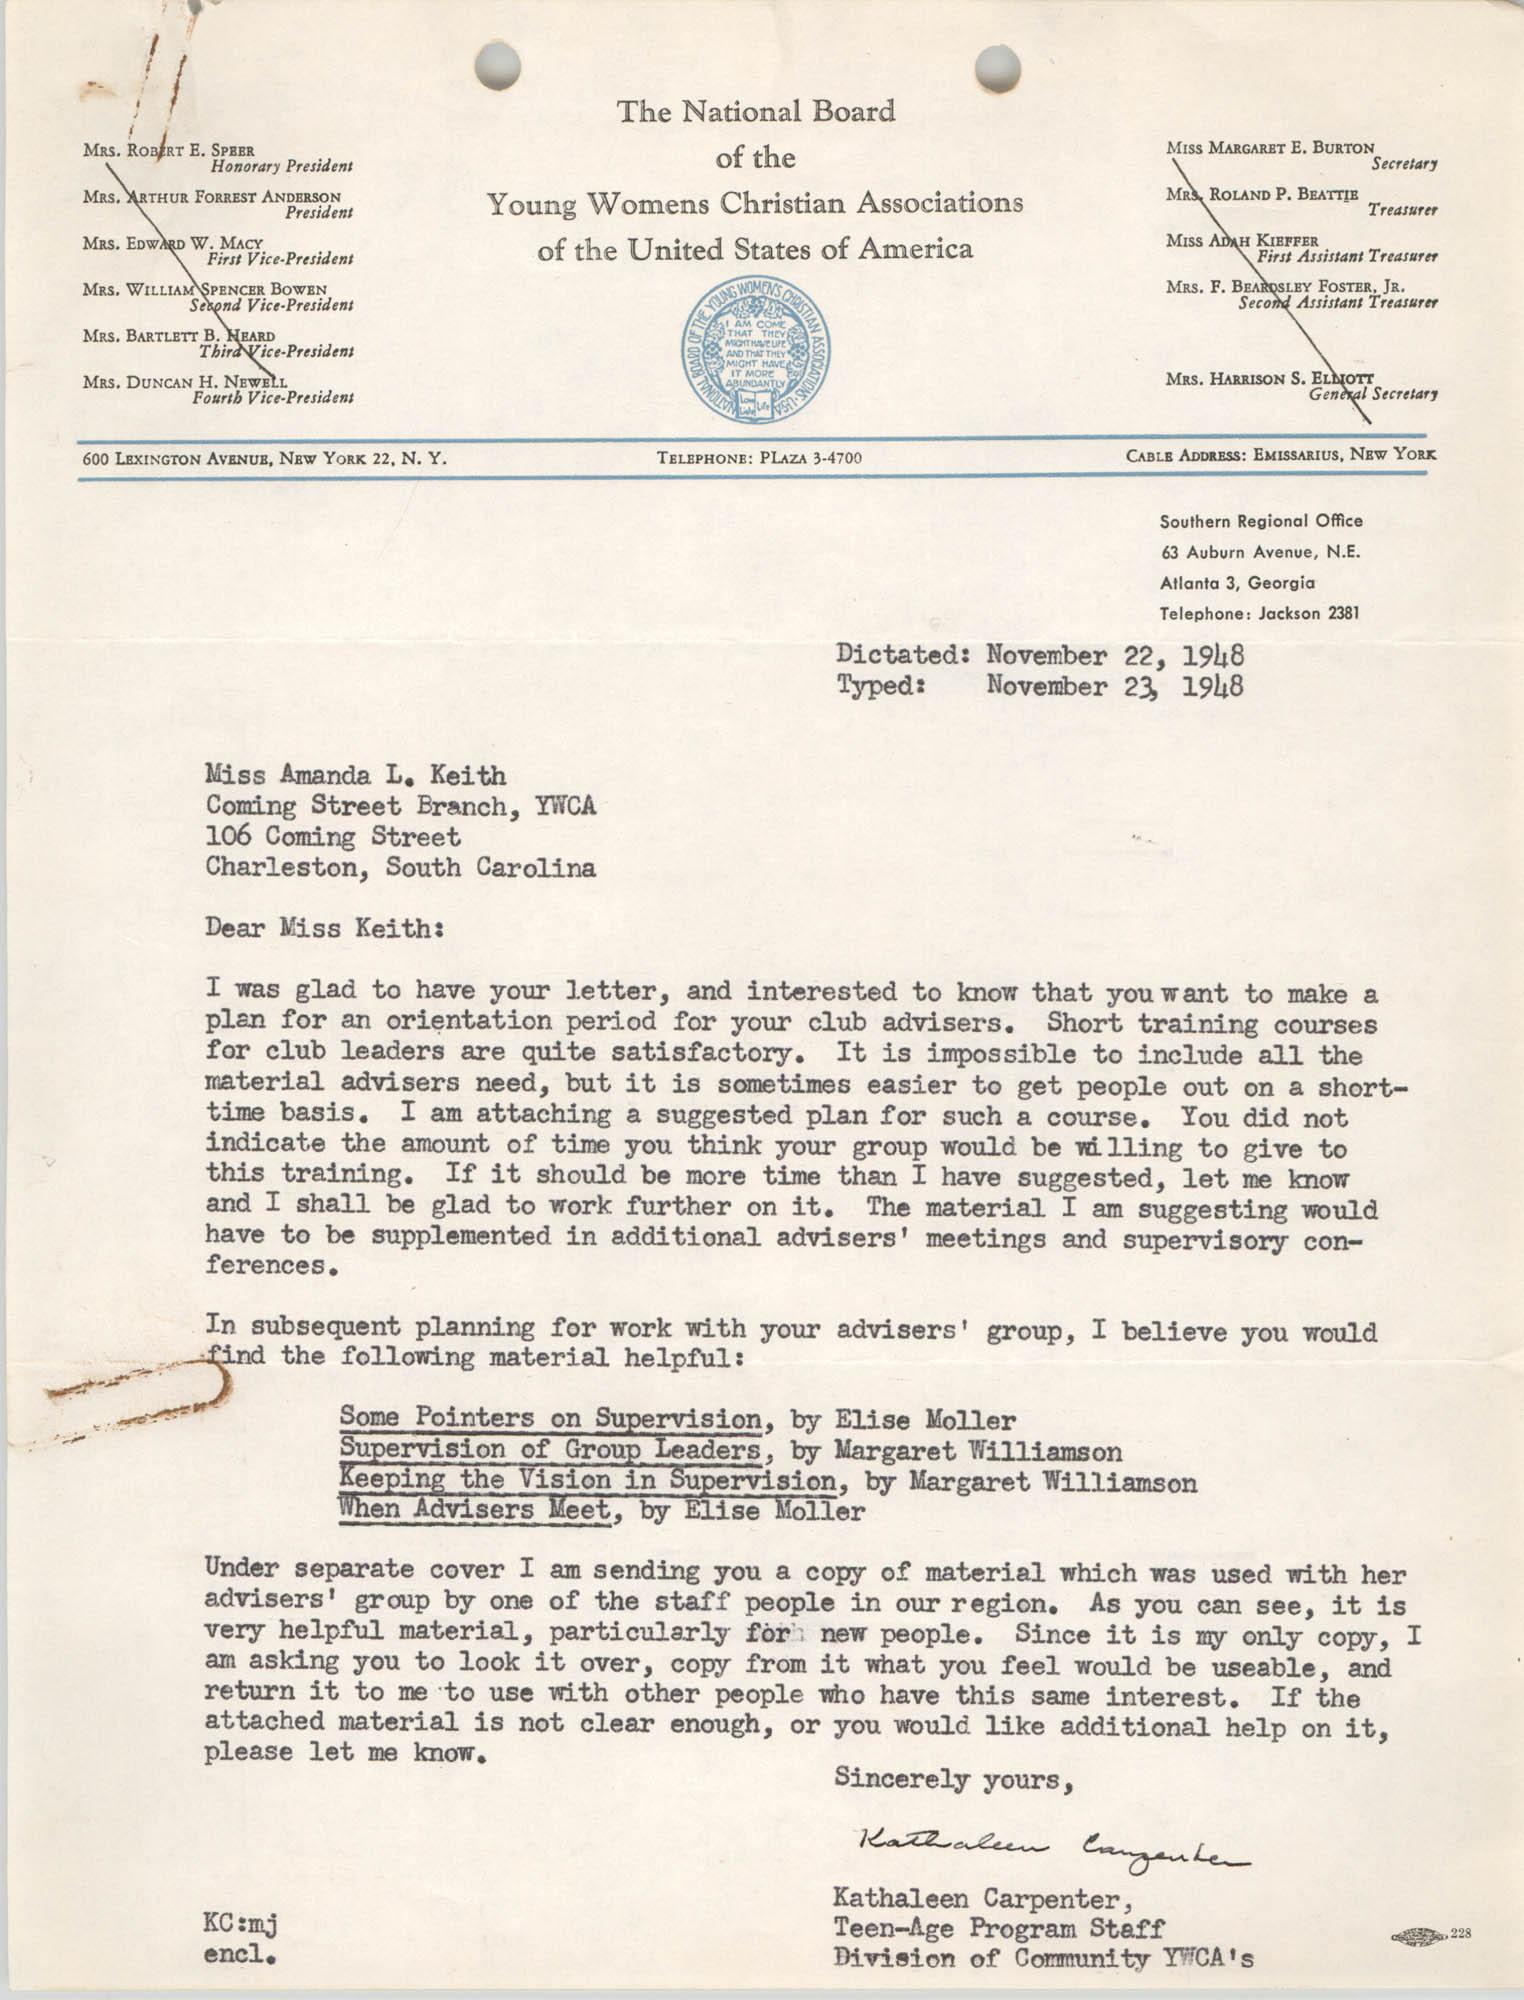 National Board of the Y.W.C.A. Memorandum, November 23, 1948